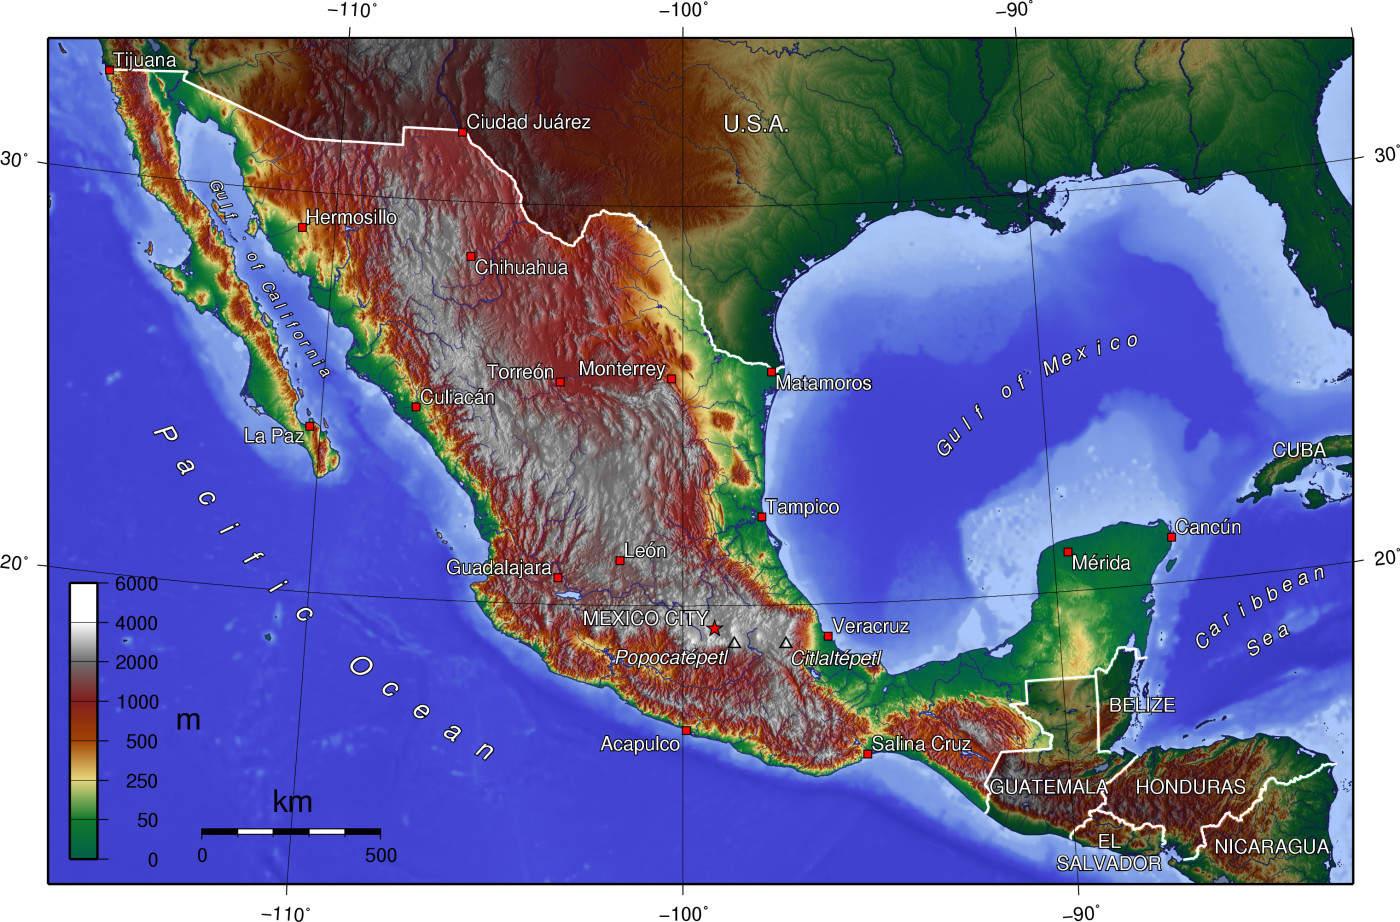 Mapa topograficzna Meksyku